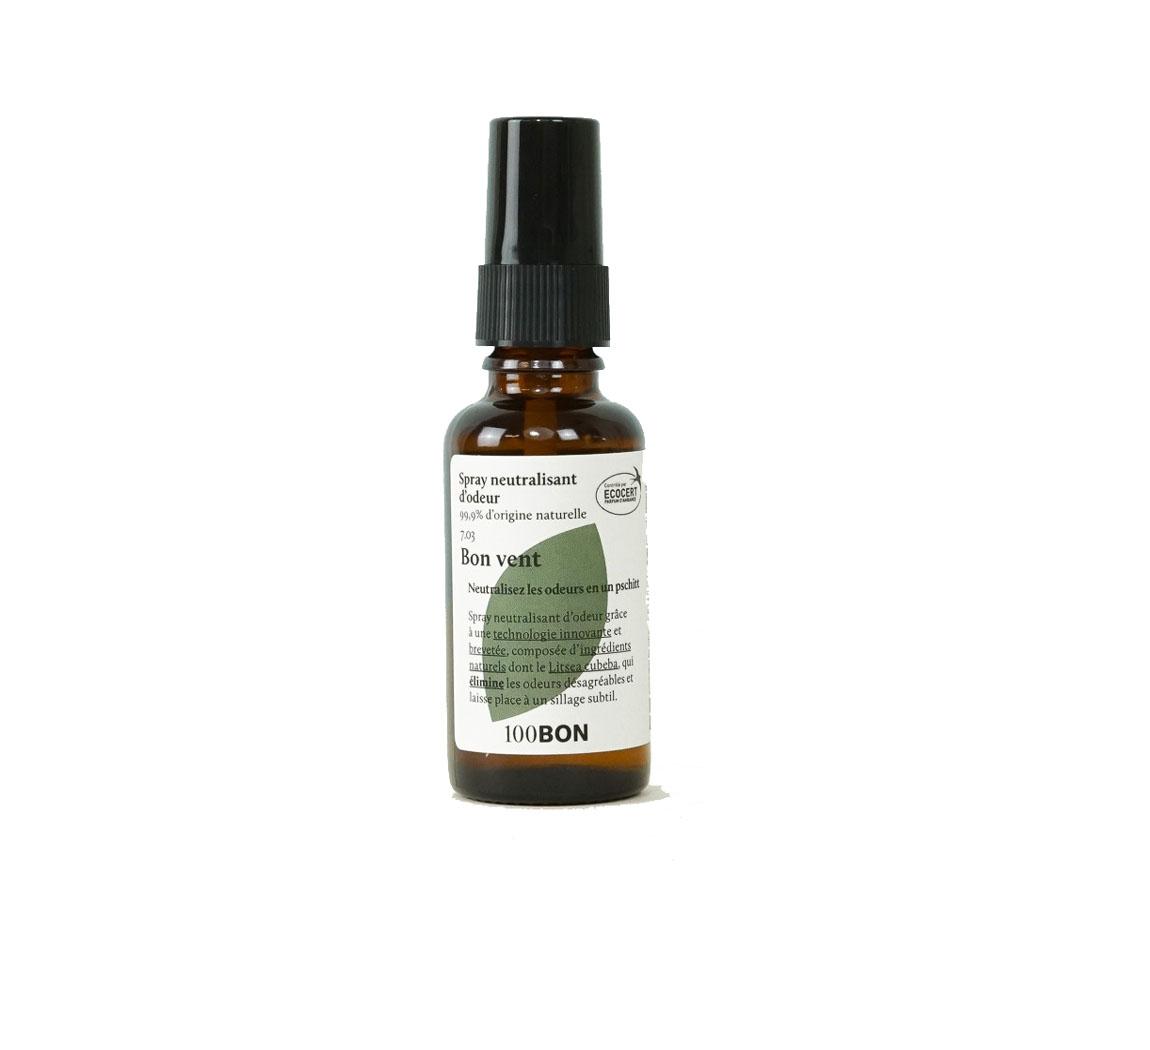 Spray neutralisant d'odeurs 100Bon Spray neutralisant d'odeurs